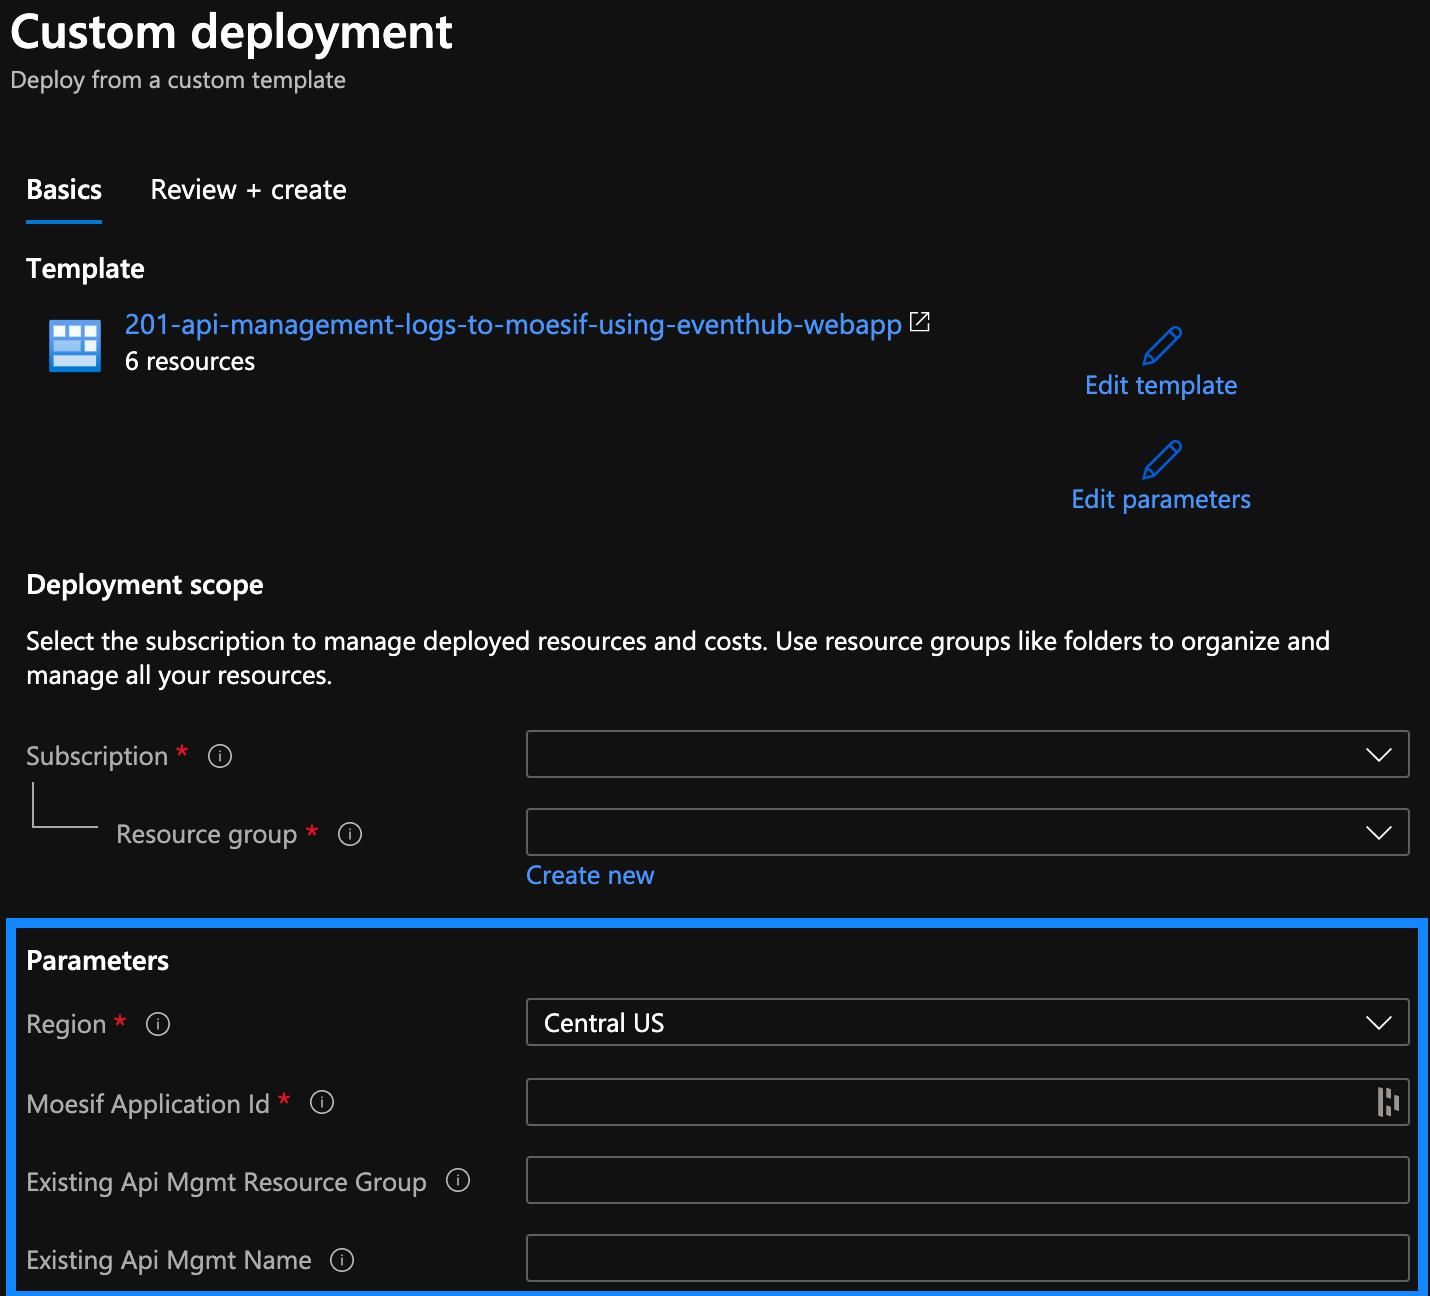 Create a Custom Deployment in Azure